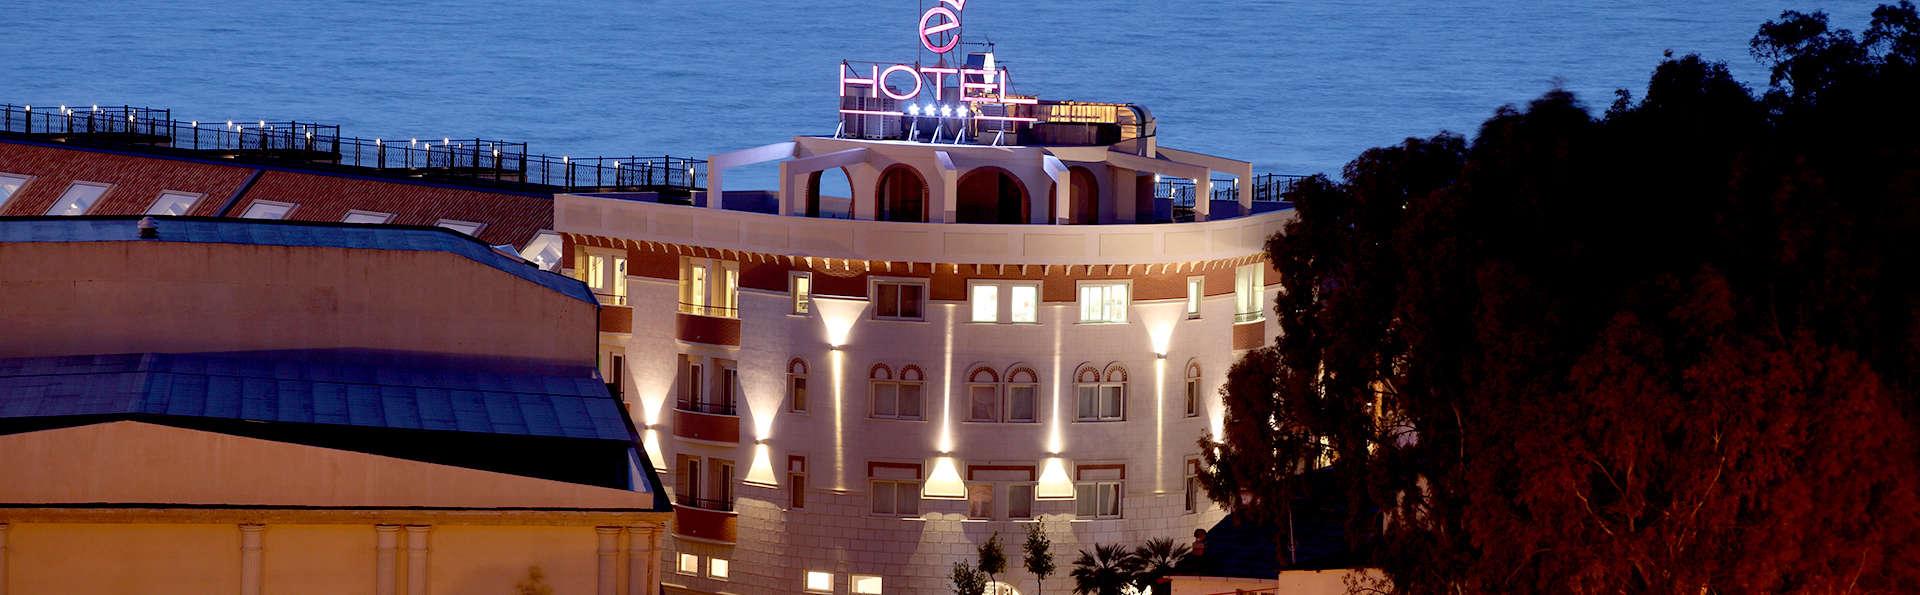 è Hotel - Edit_Front2.jpg